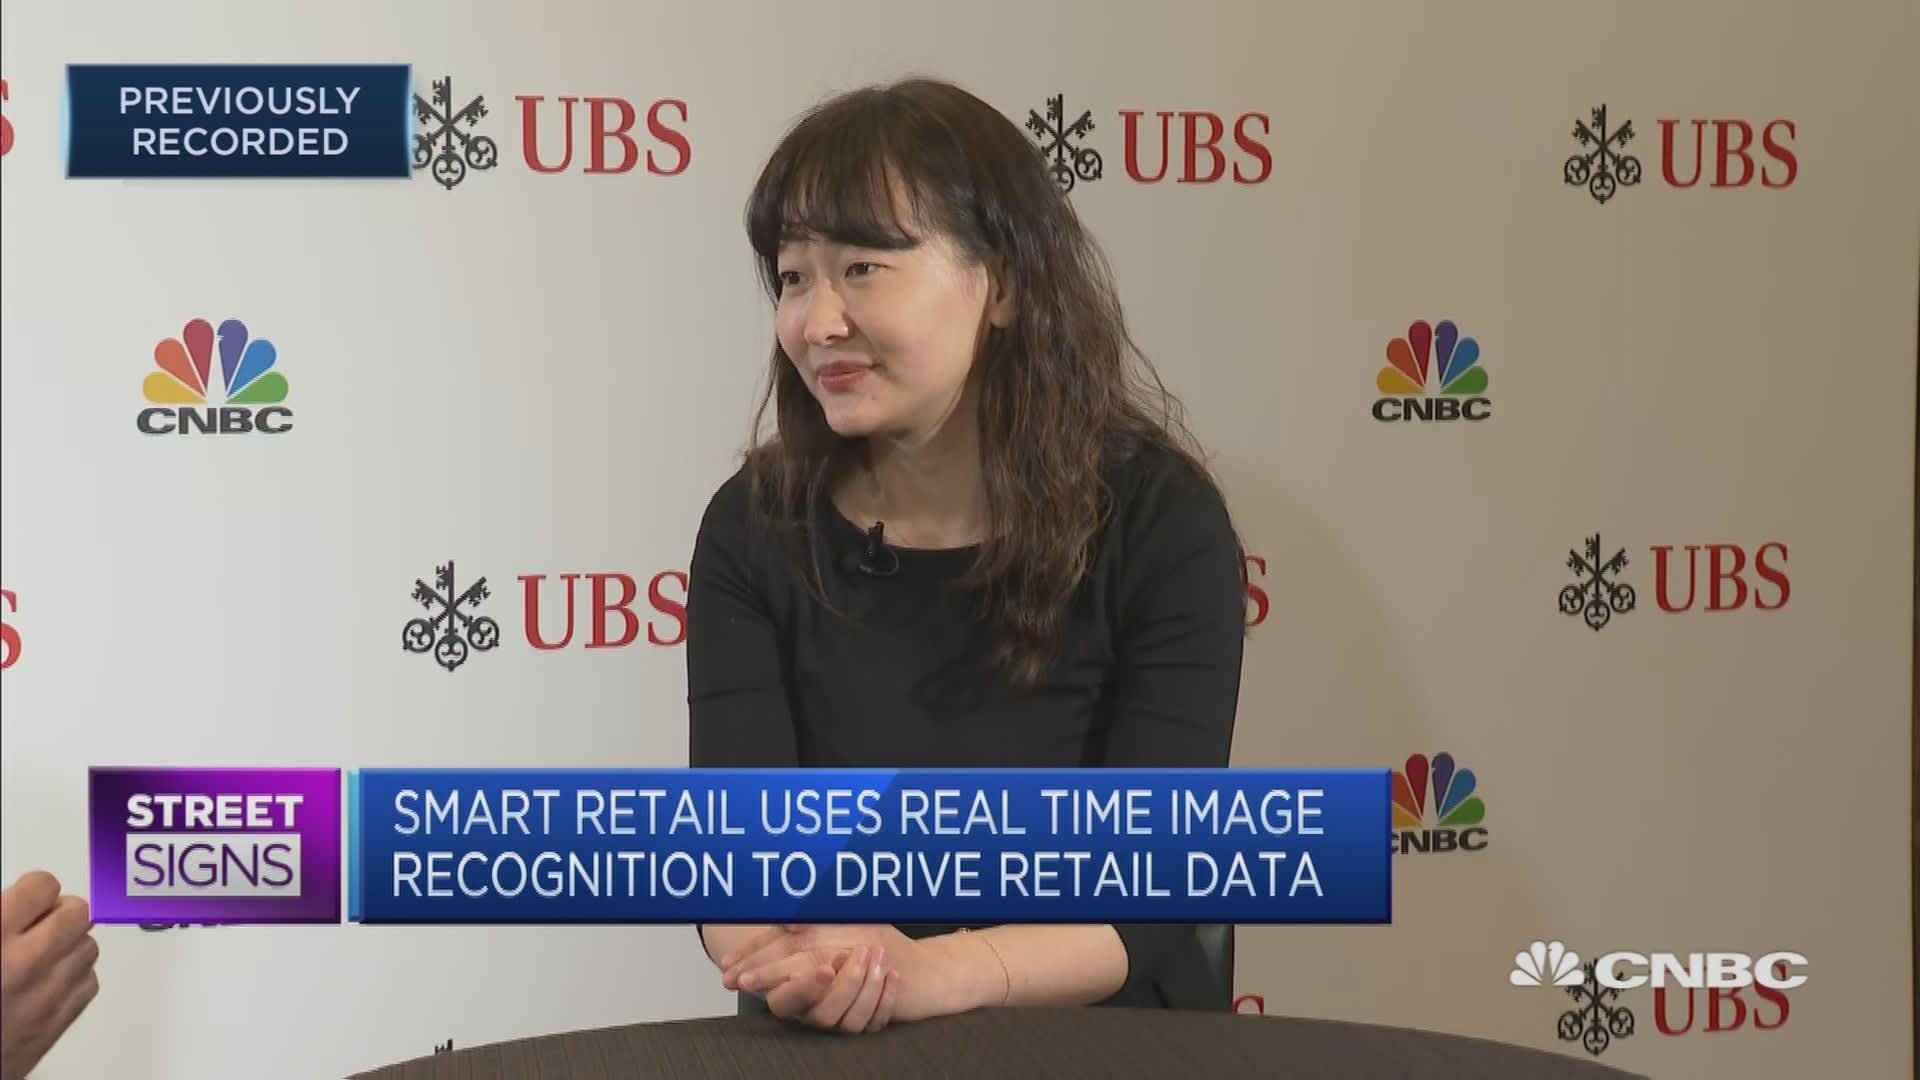 Clobotics: Taking on smart wind and smart retail